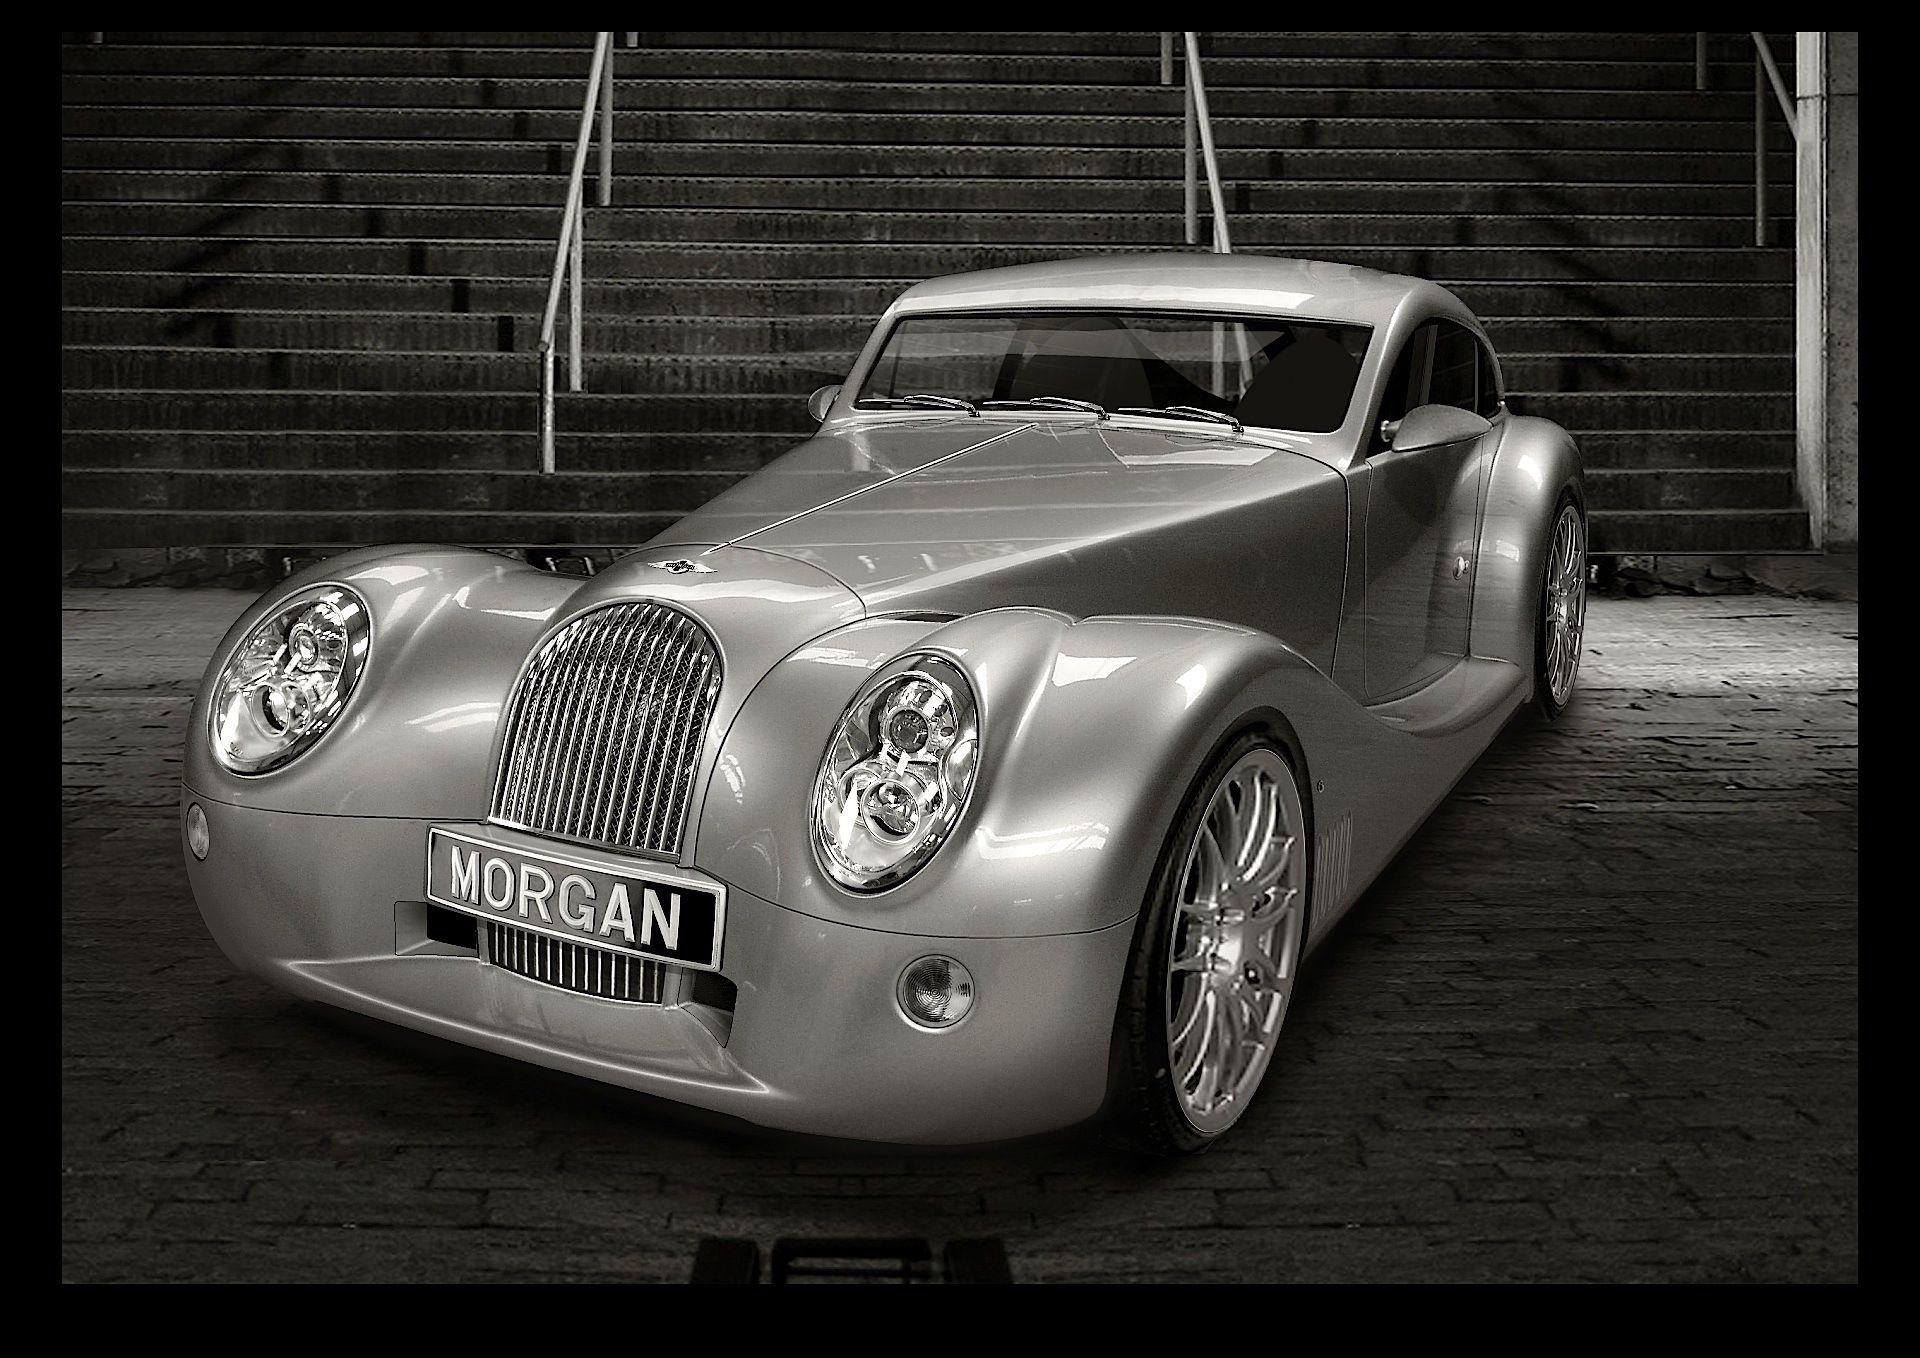 Morgan Aero 8 Coupe | Wheels | Pinterest | Wheels and Cars